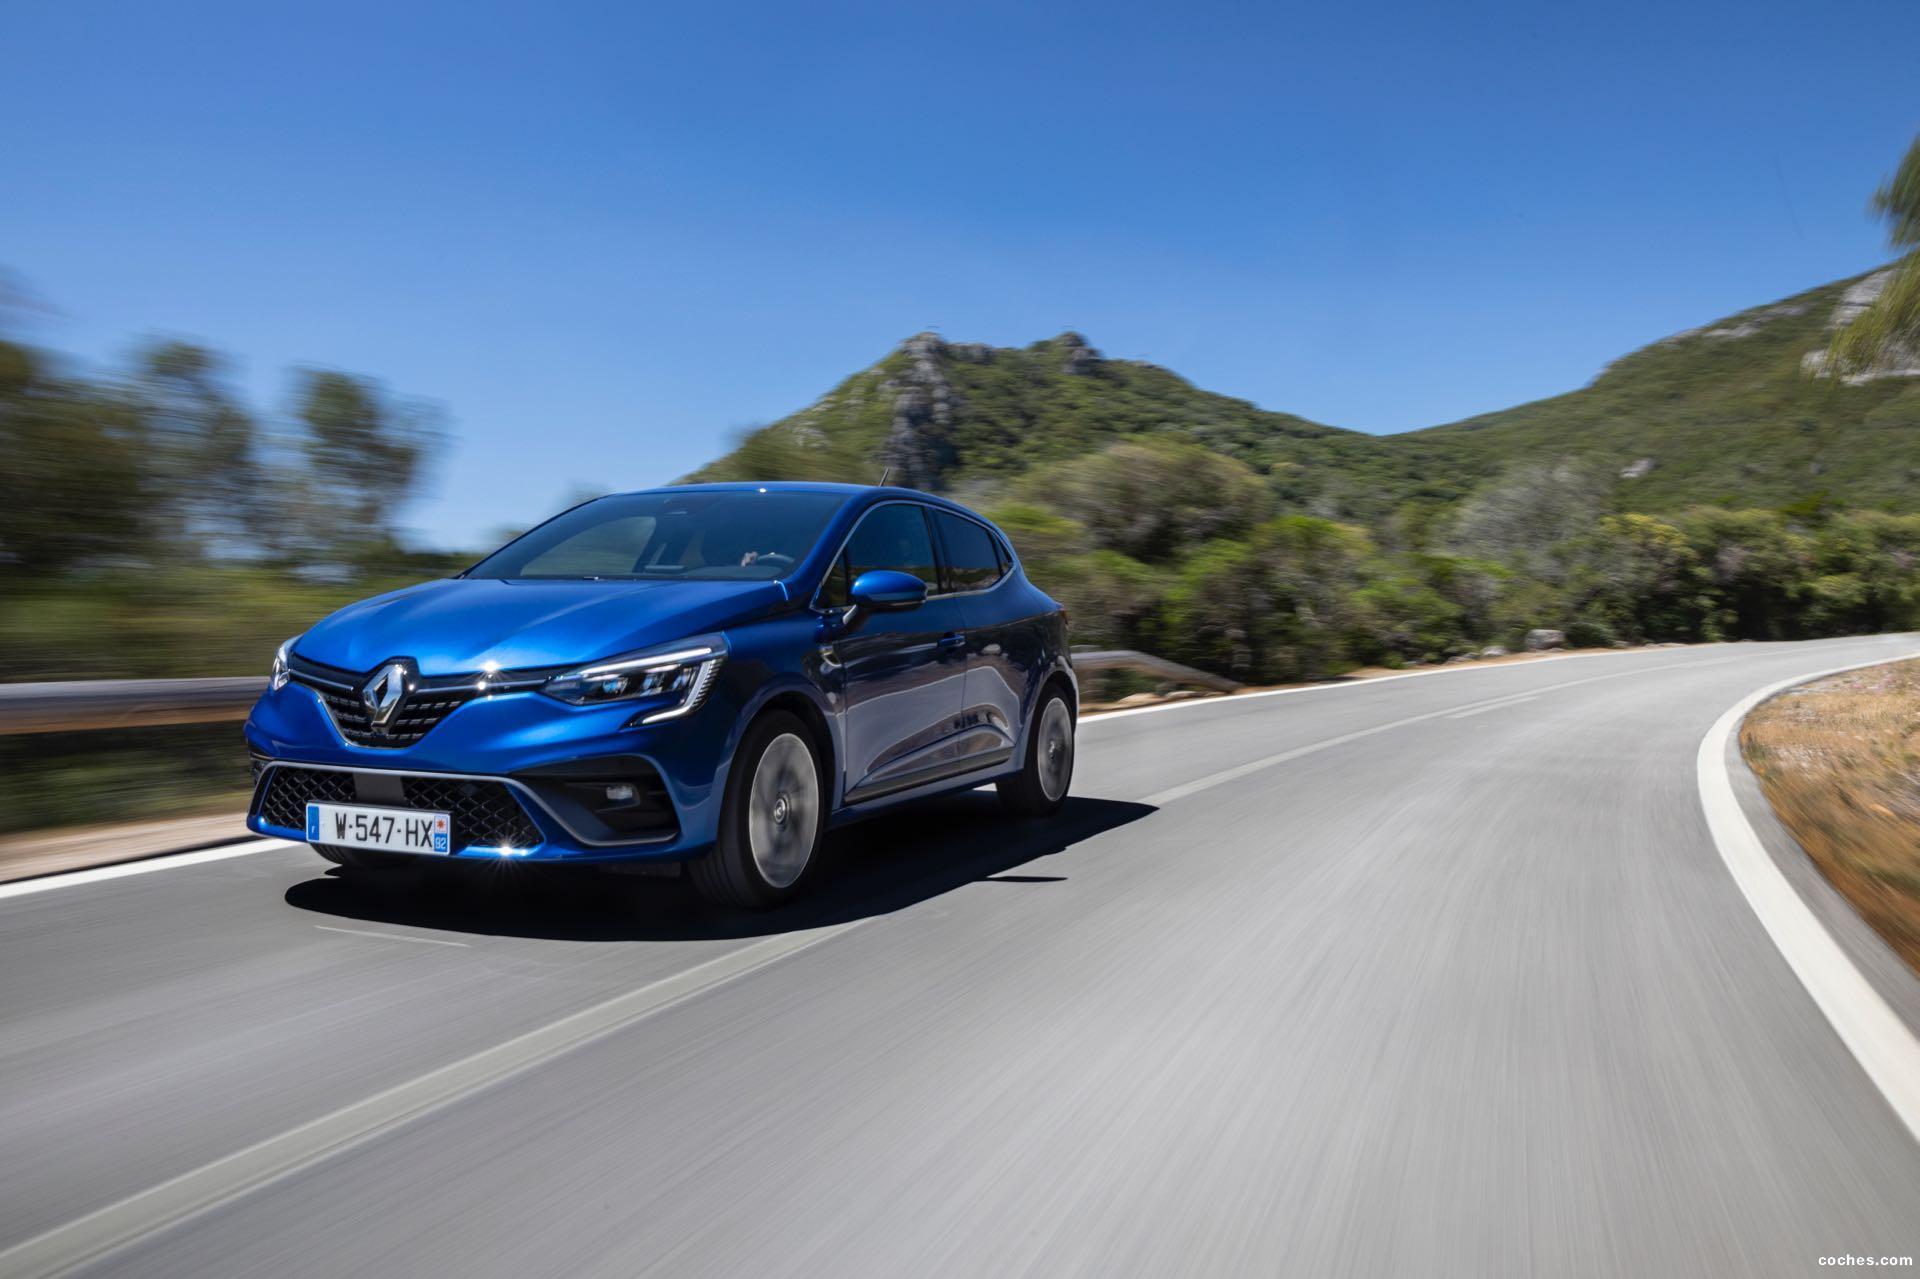 Foto 17 de Renault Clio R.S. Line 2019